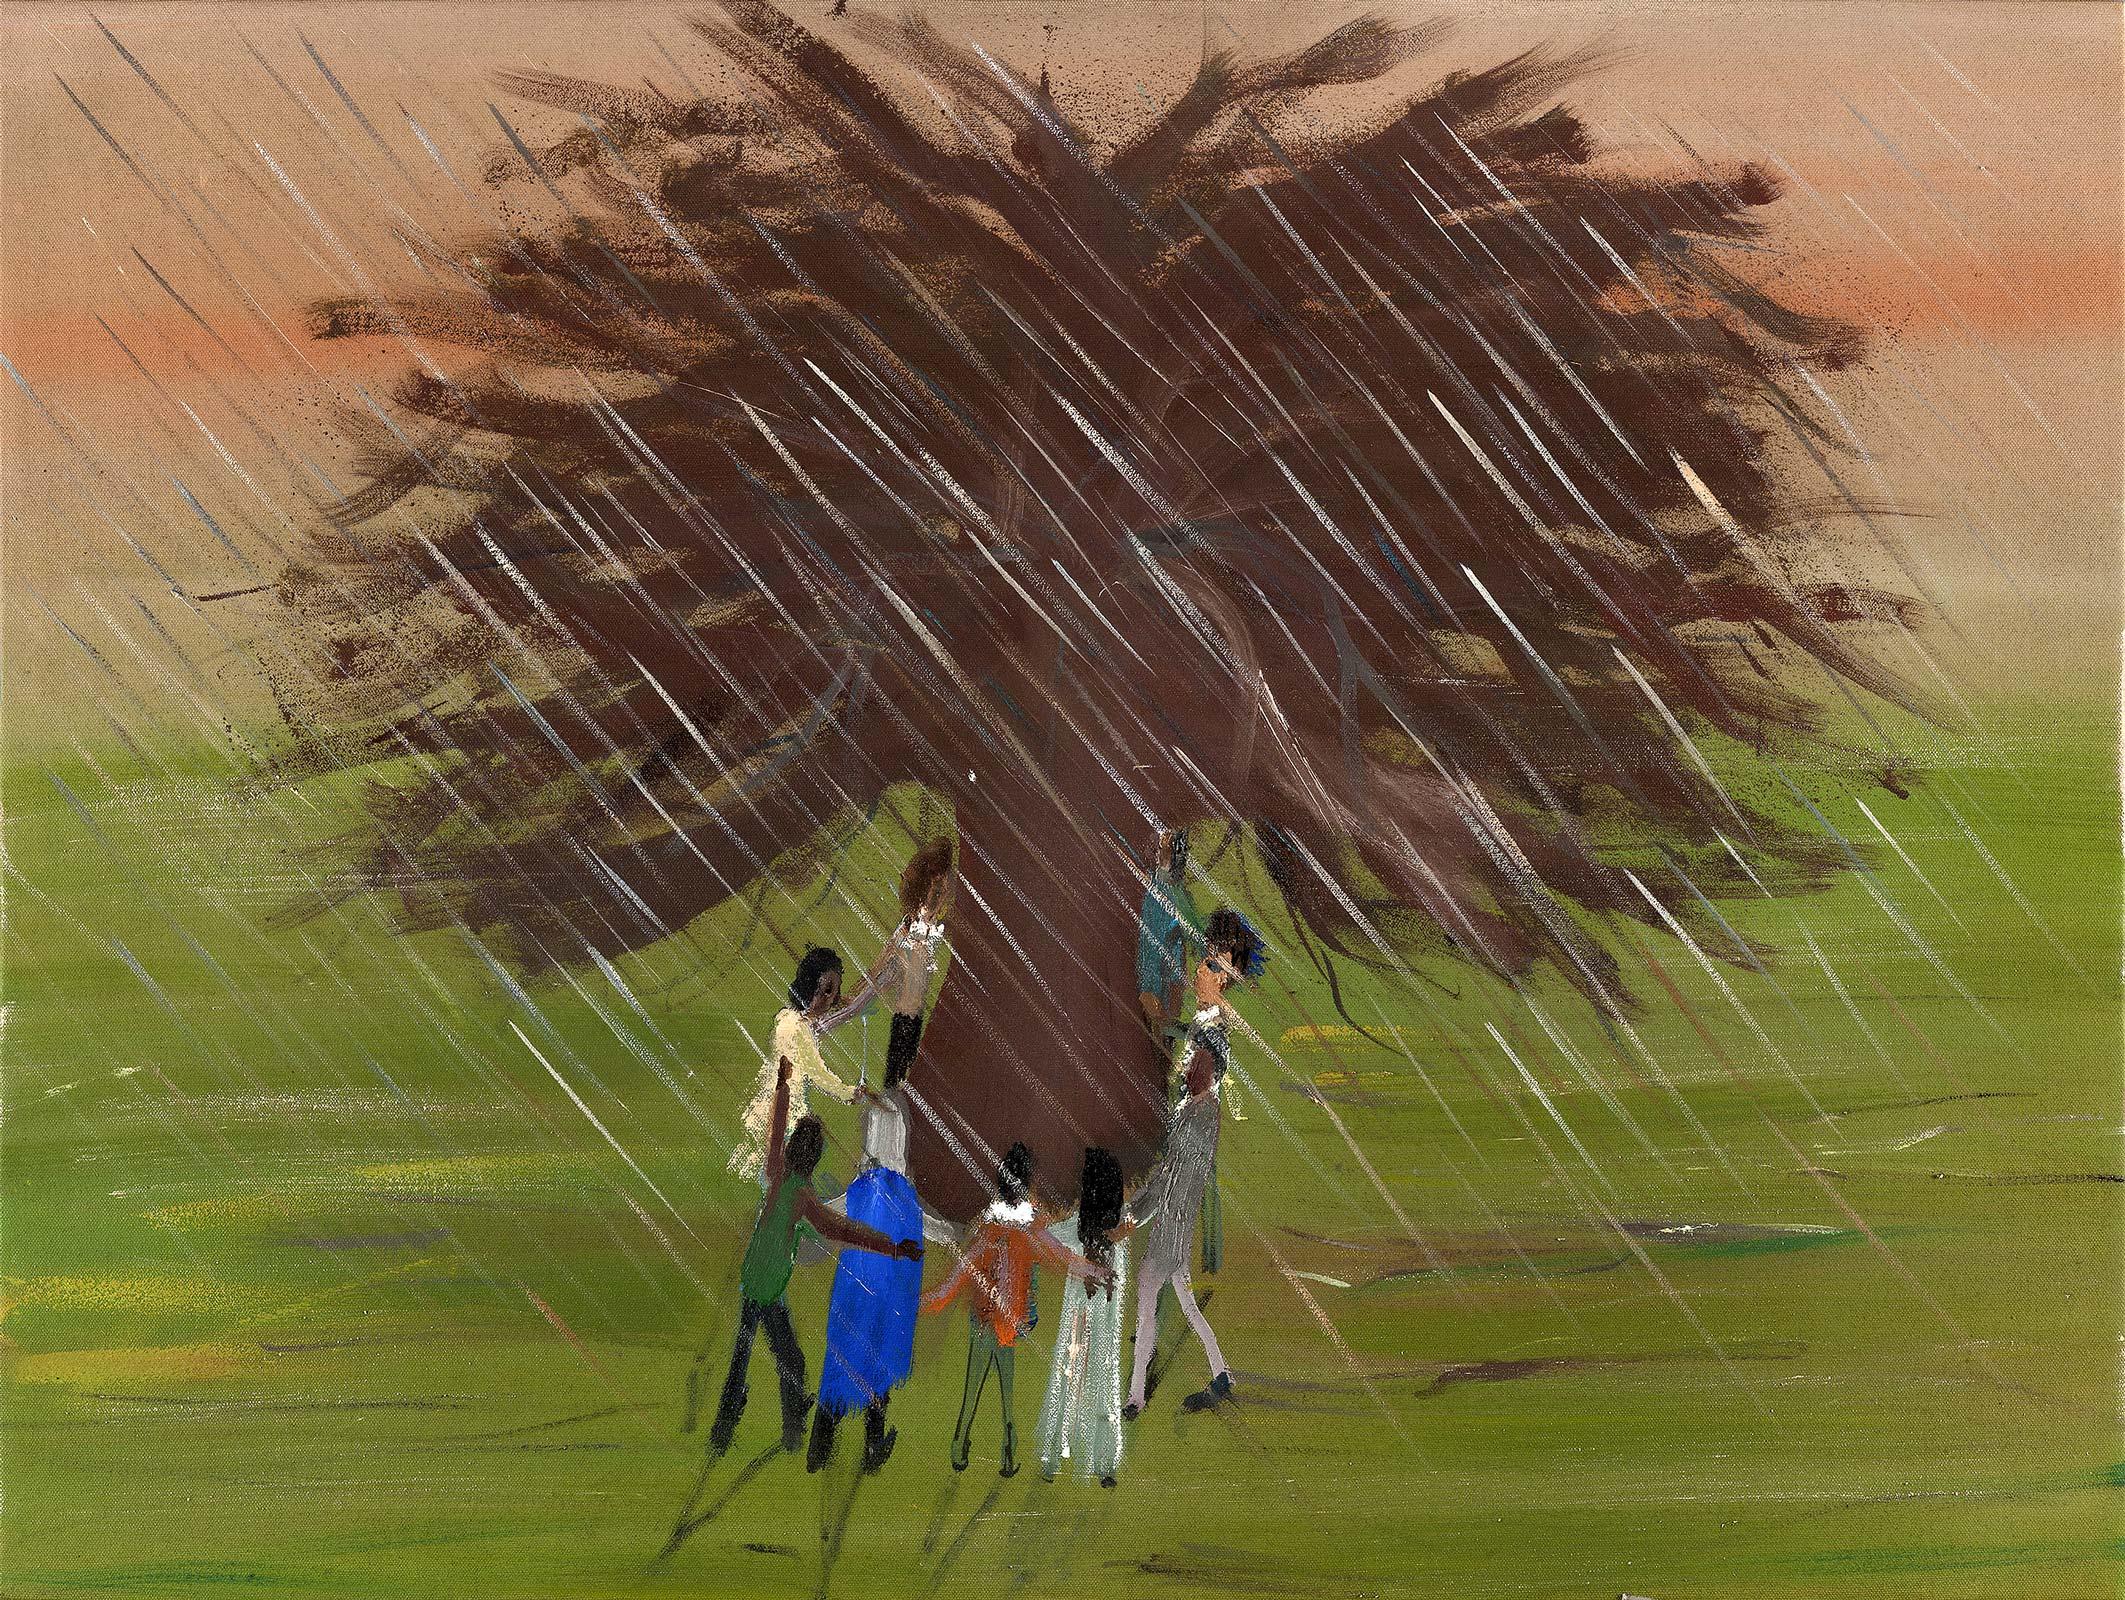 Reunion,2014  Oil on canvas,60x80 cm